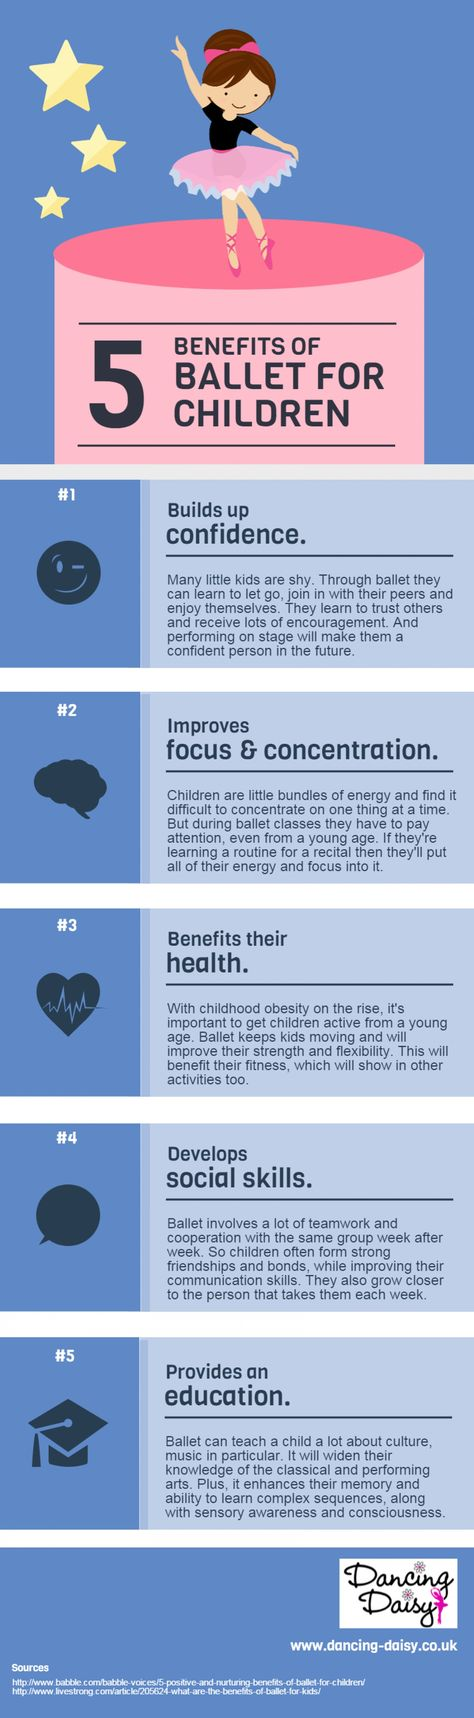 5 Benefits of Ballet for Children Infographic